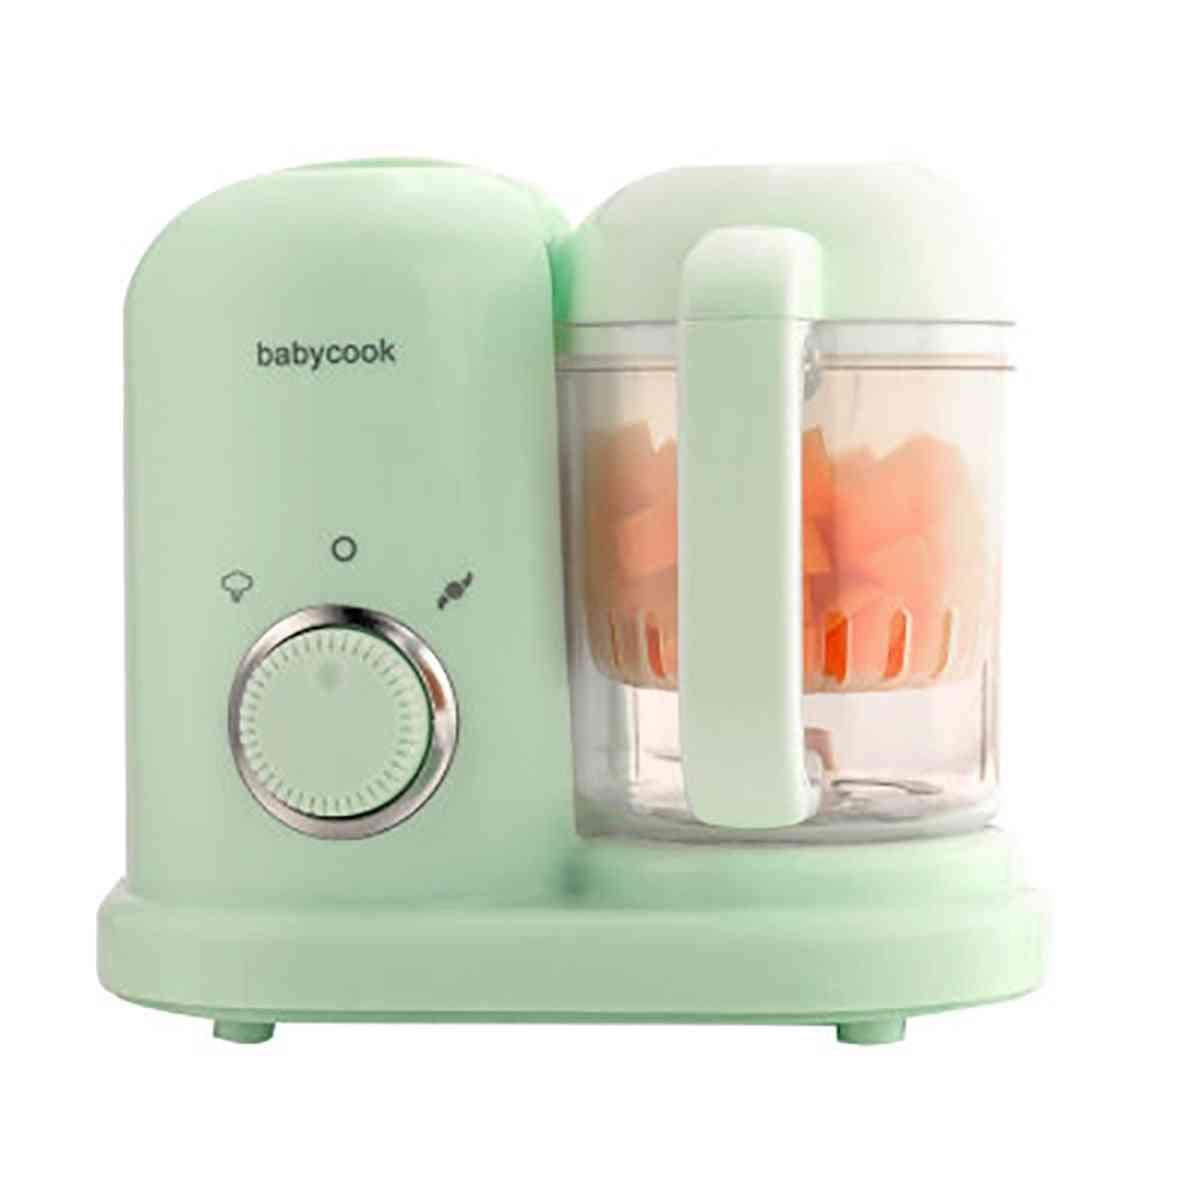 Electric Baby Food Maker, Multifunction Cooking Steamer, Mixing Grinder, Blenders, Processor Juicing Stirring